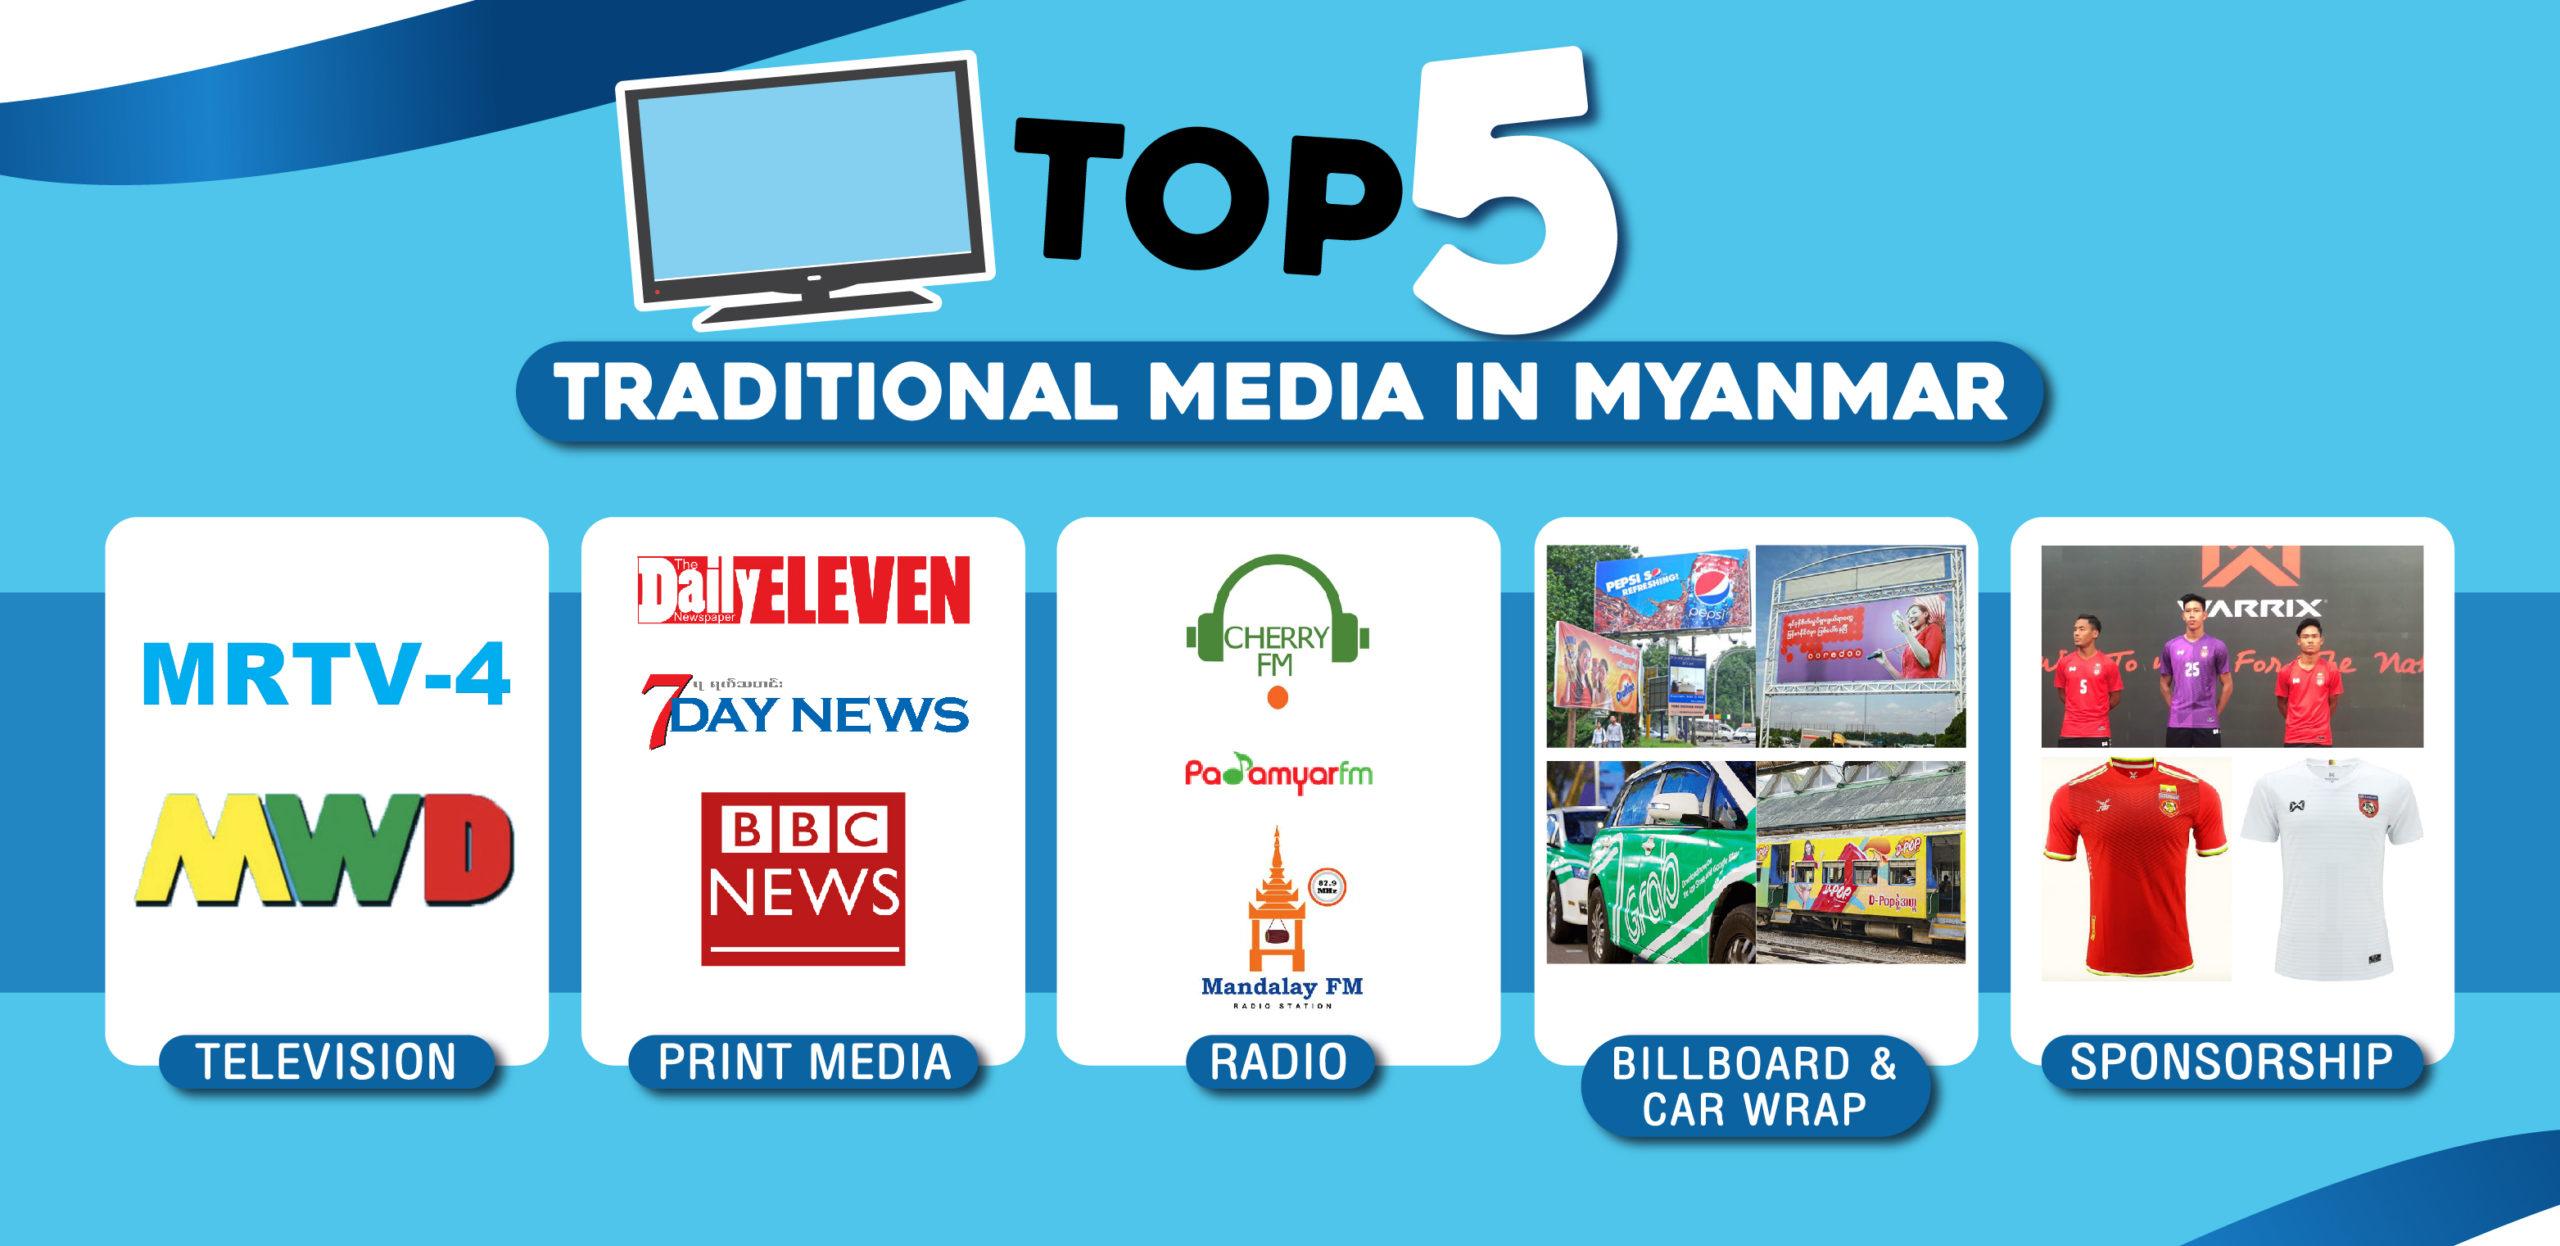 Top5 Traditional Media In Myanmar